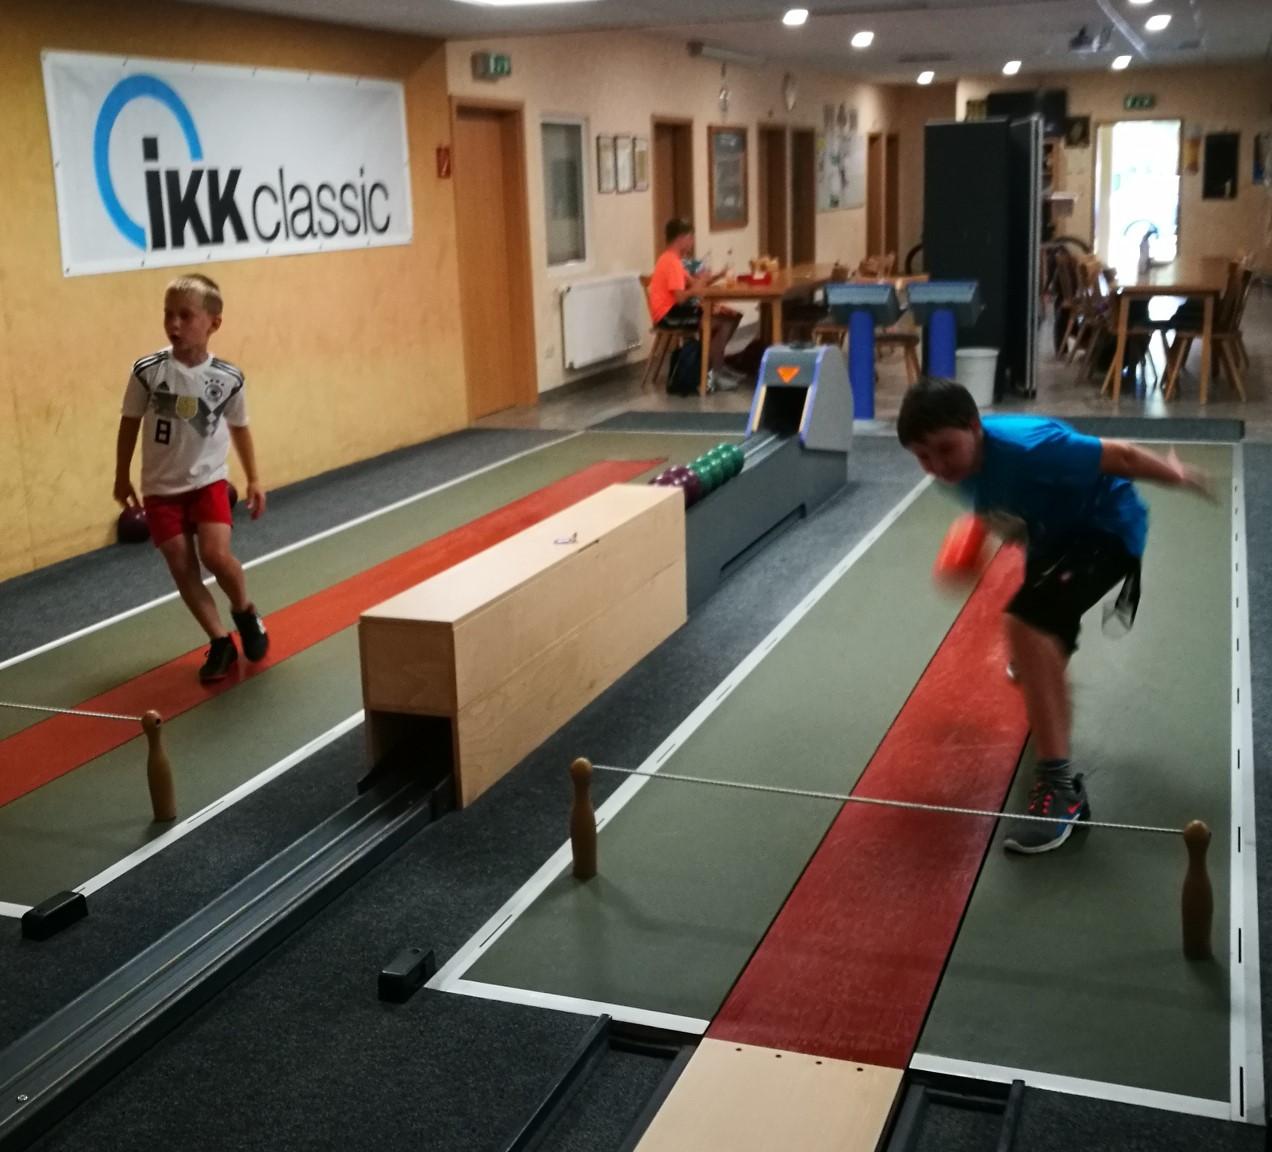 Sommerferienprogramm 2020 beim KSV-Wetzlar